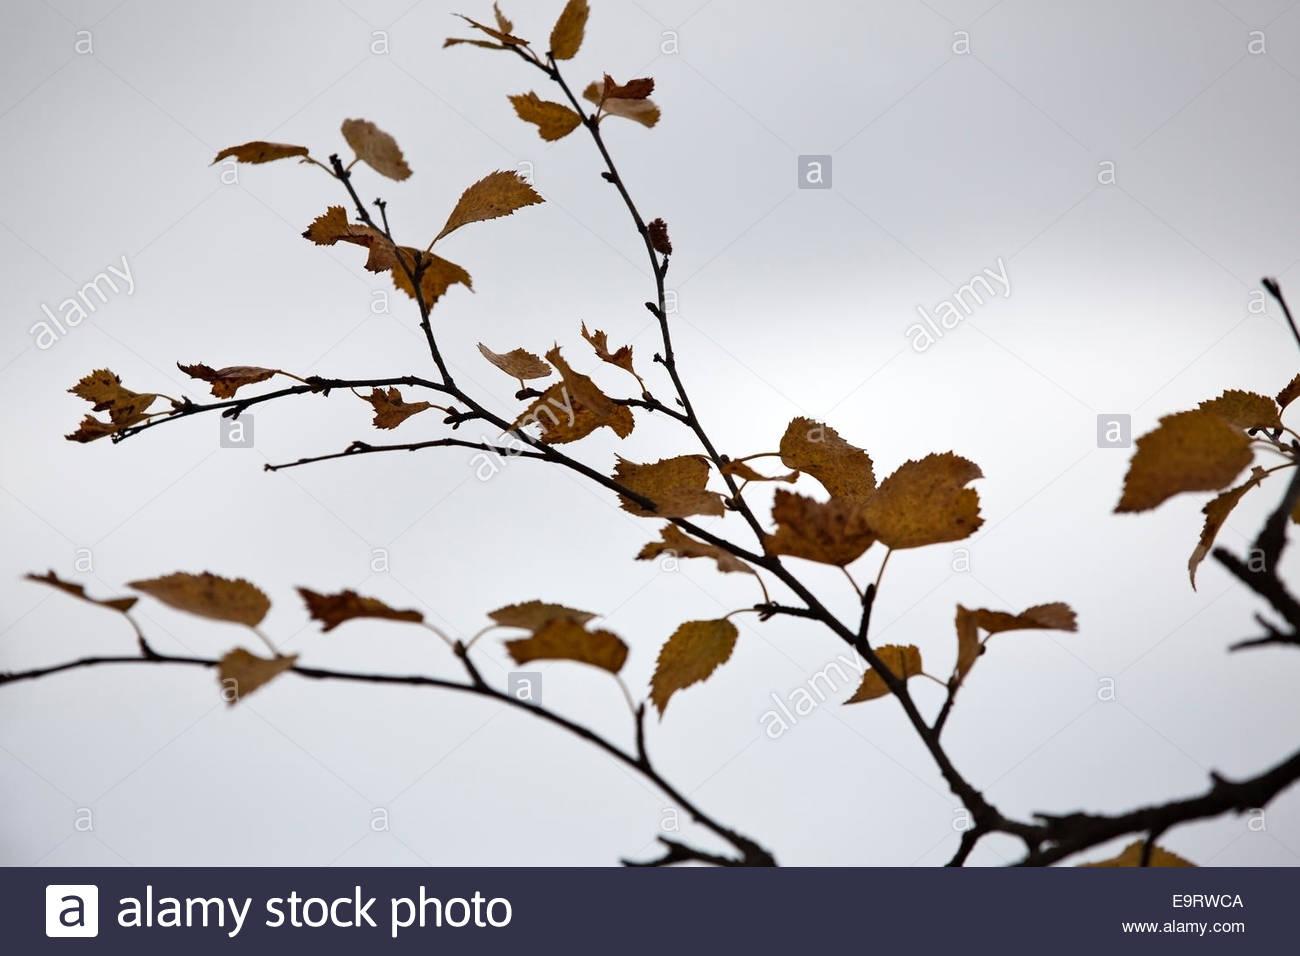 Birch twig towards gray sky - Stock Image